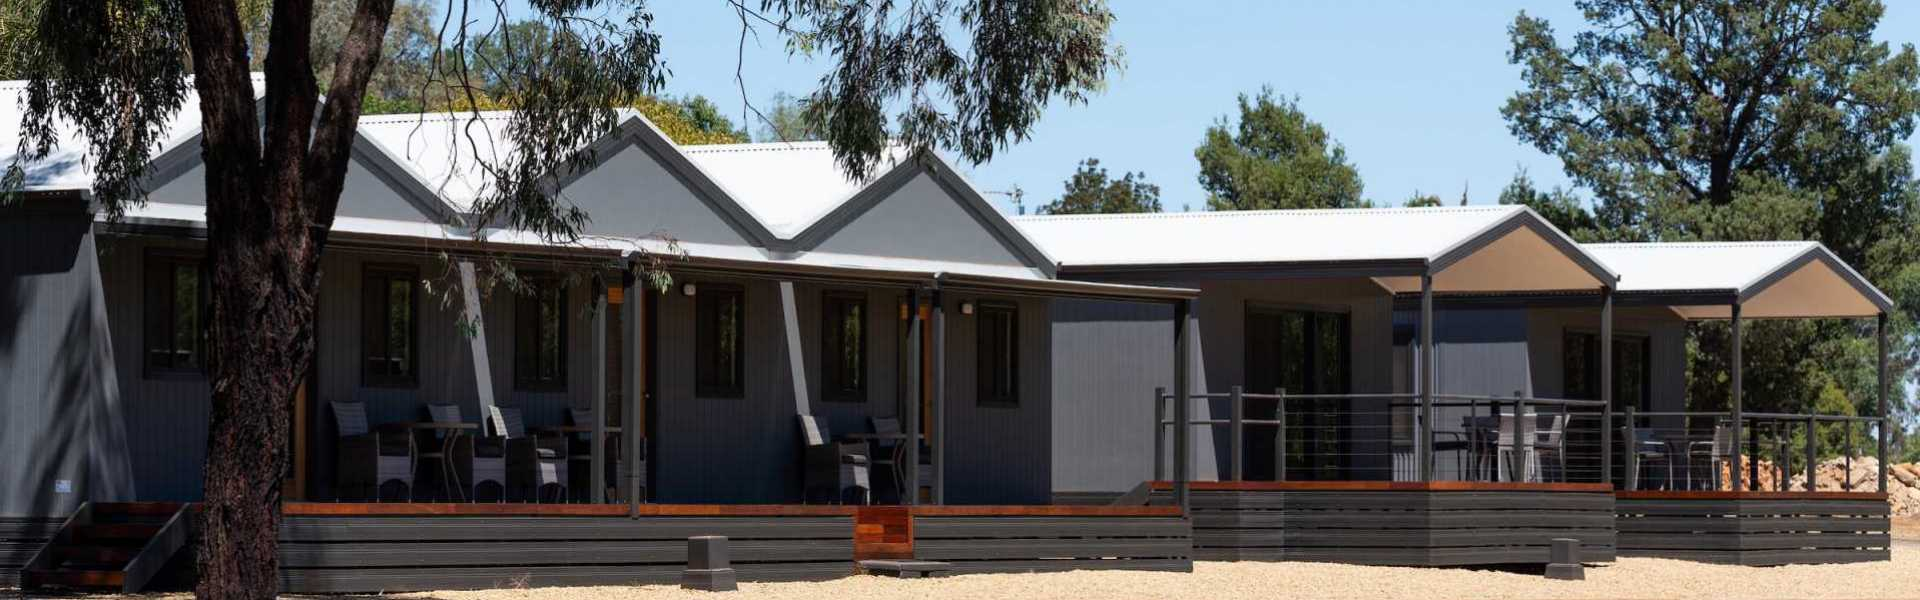 Kui Parks, Horseshoe Tourist Park, Wagga Wagga, Villas and Studios